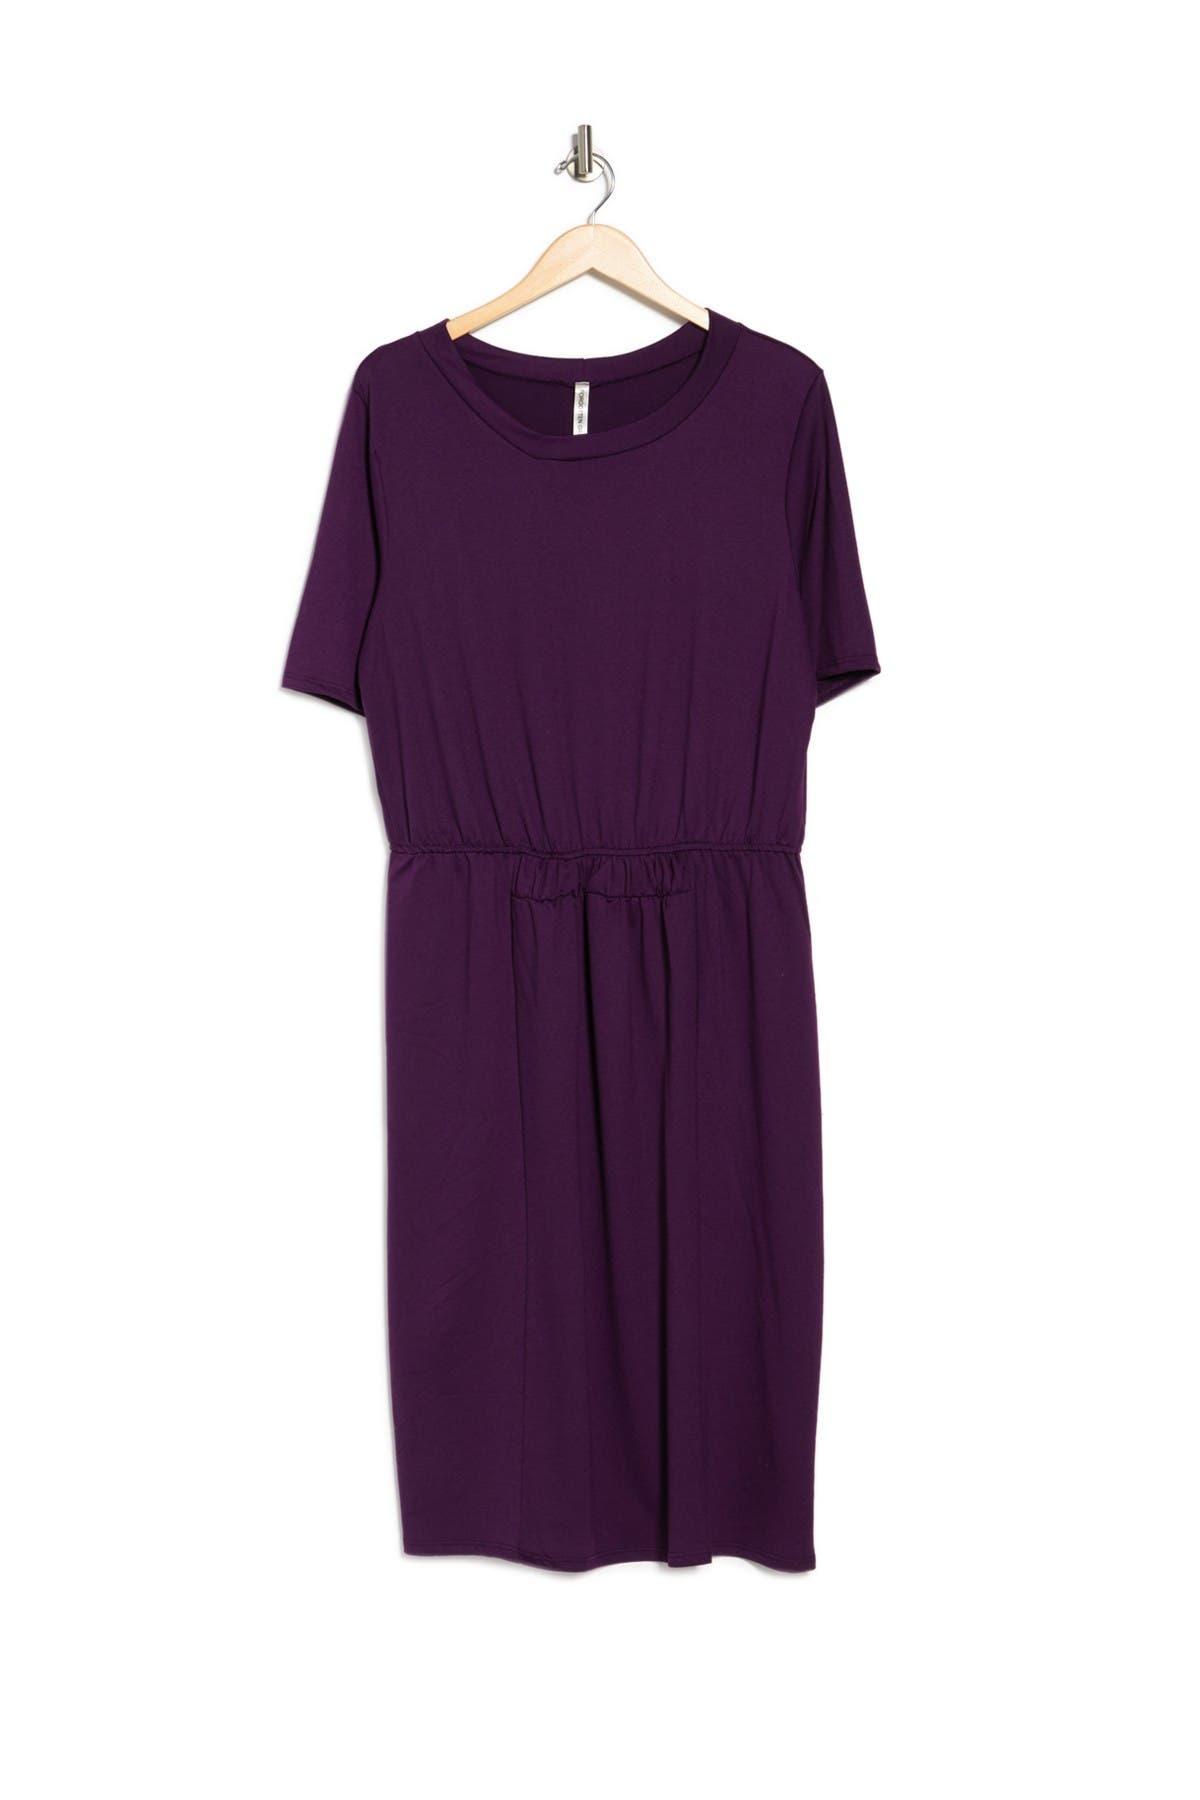 Image of Forgotten Grace Short Sleeve Smock Waist Dress